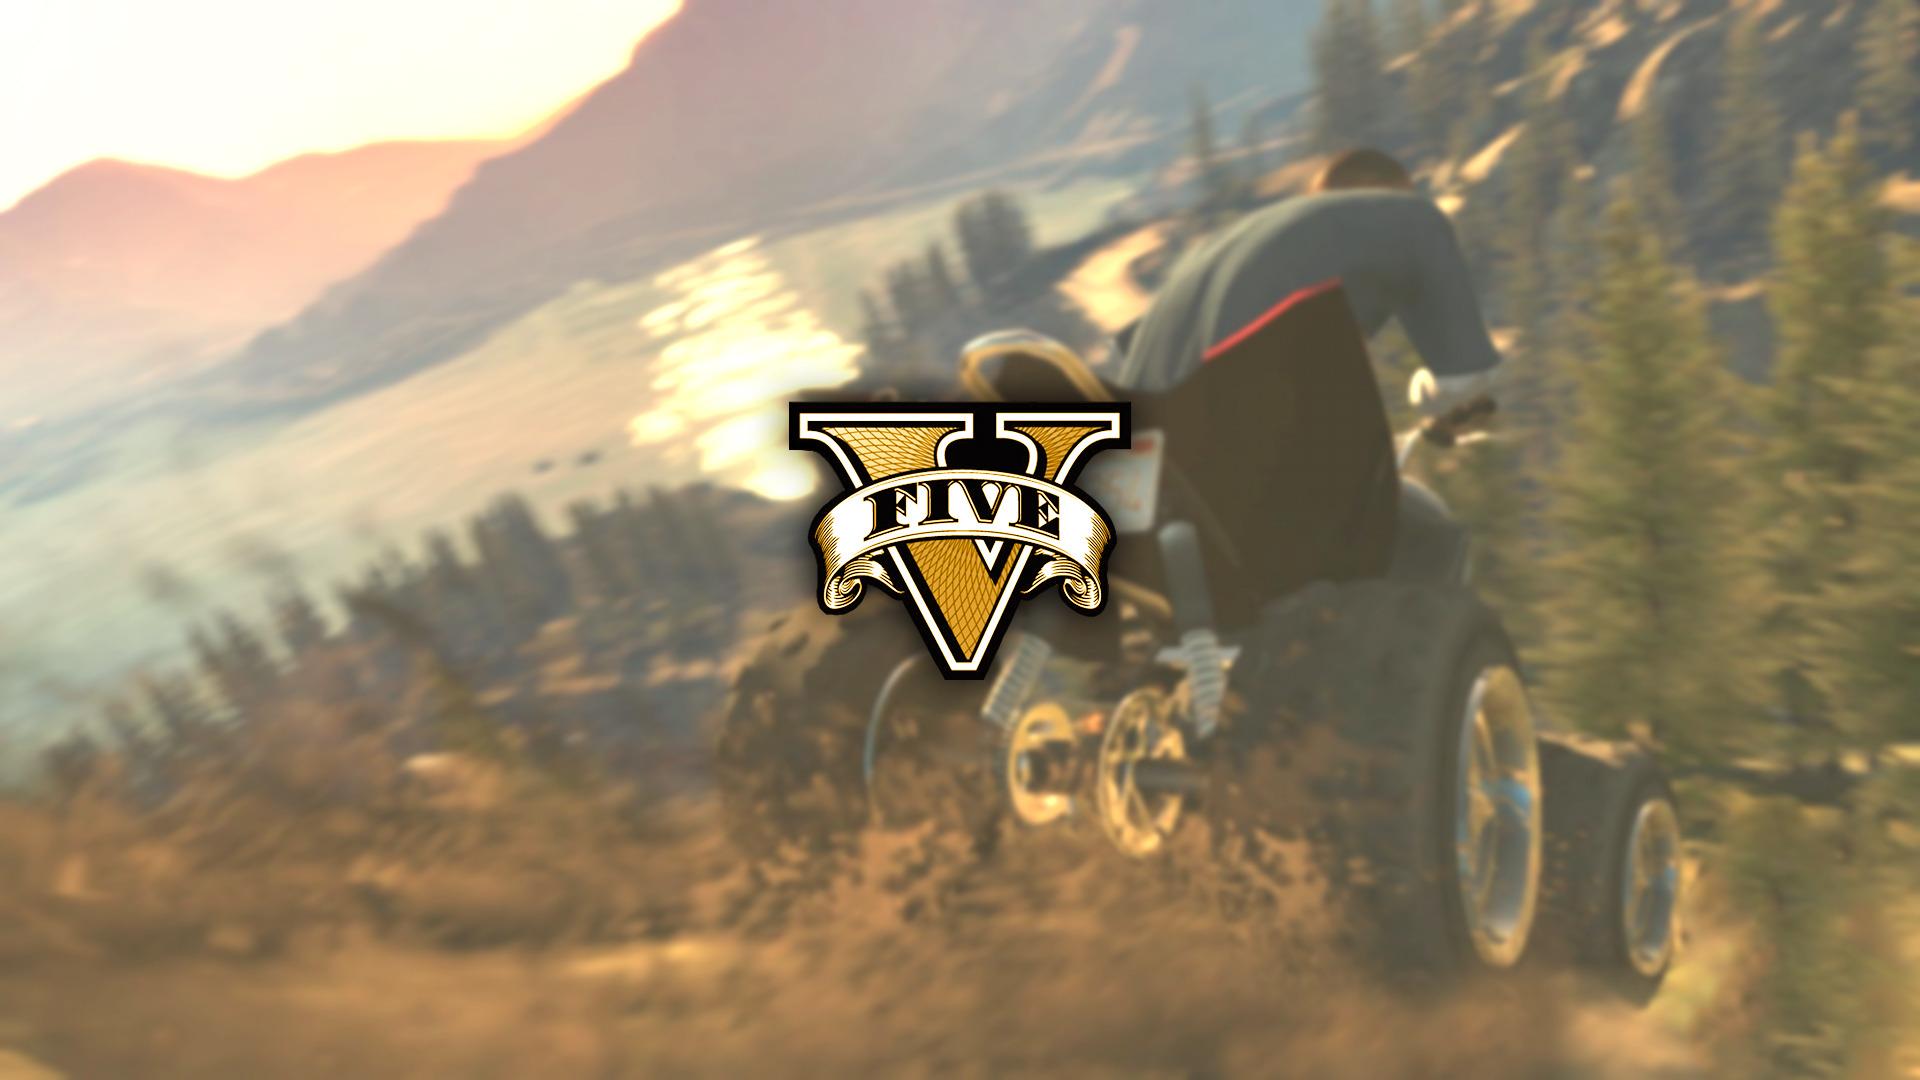 Grand Theft Auto V wallpaper 32111 1920x1080